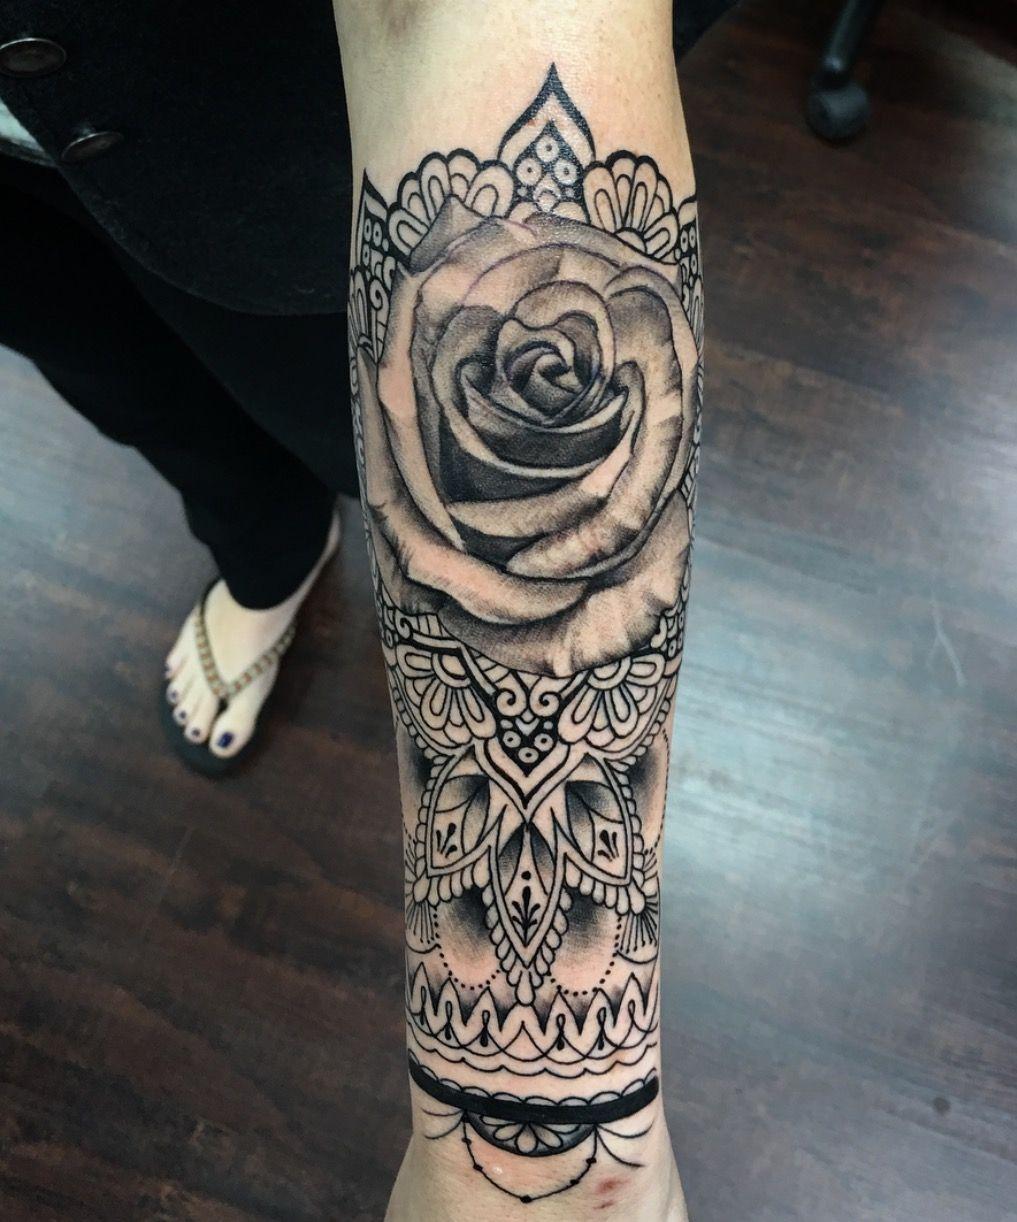 Rose Mandala Tattoo : mandala, tattoo, Mandala, Tattoo, Realistic, Rose!, 😍😍😍, Tattoos,, Tattoo,, Design